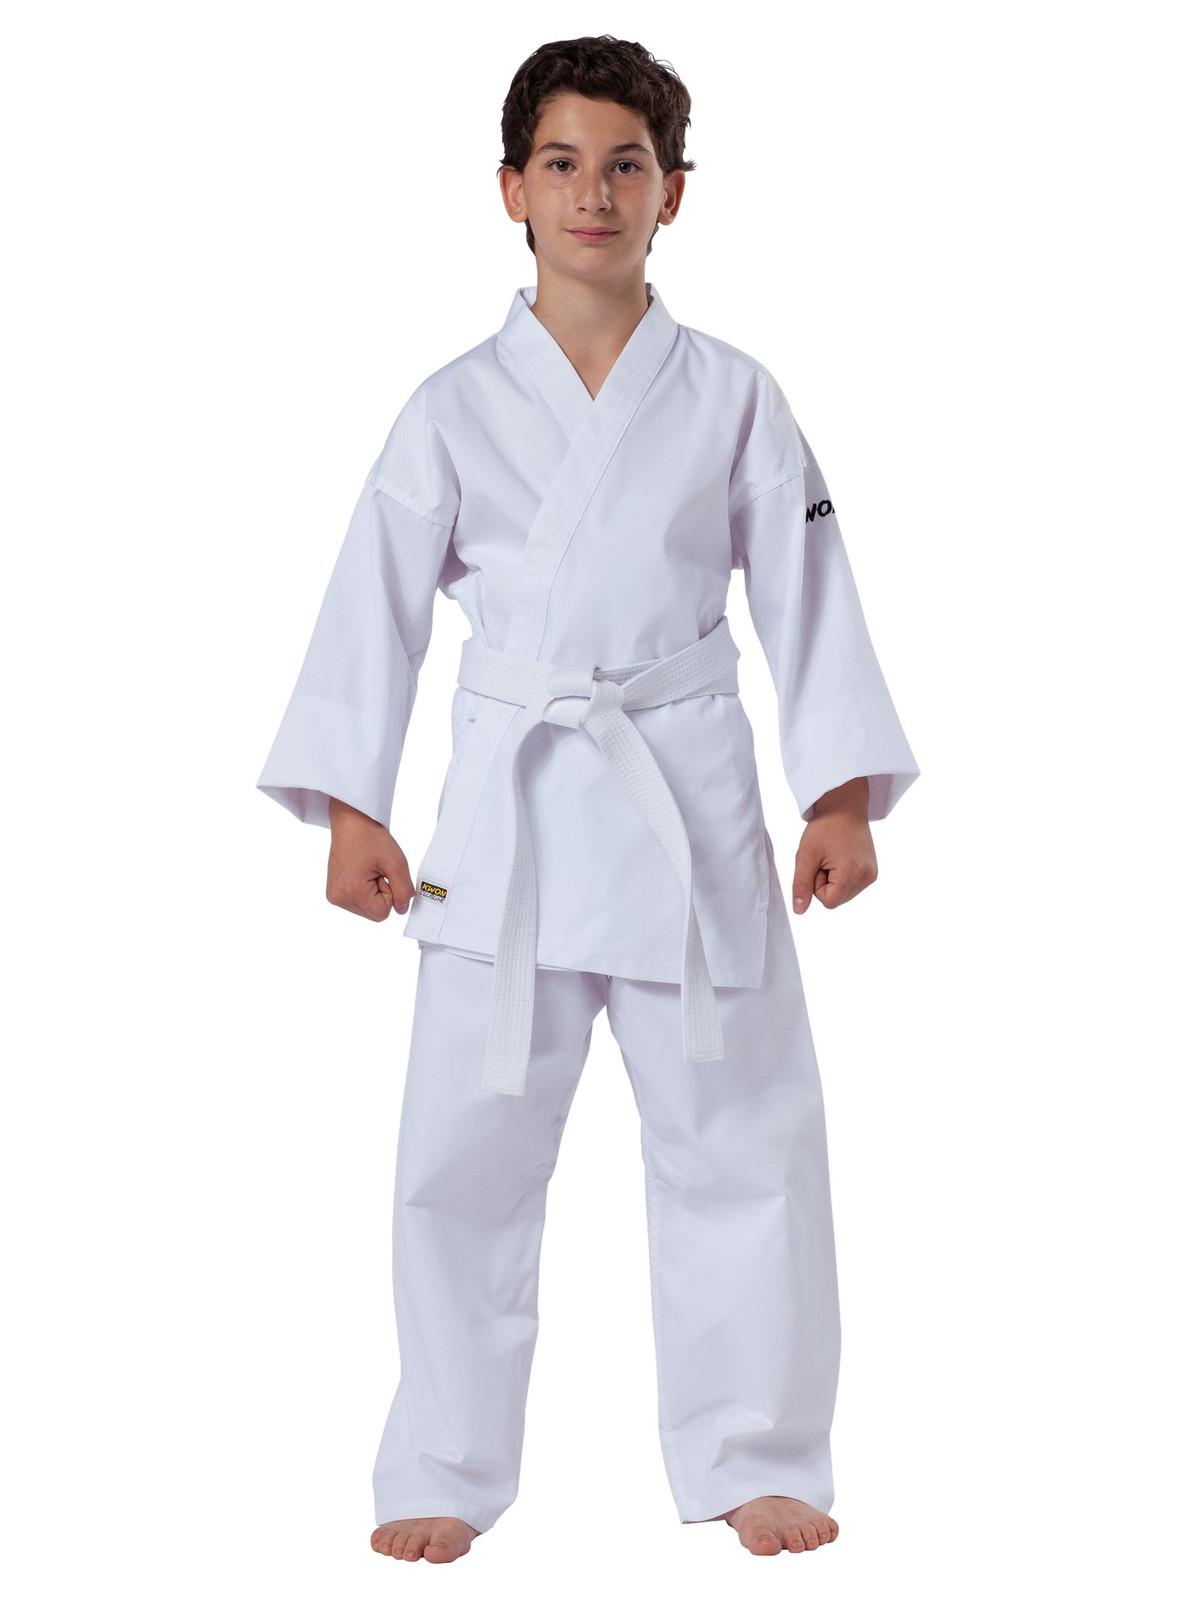 KWON CLUBLINE Karateanzug Junior / Basic